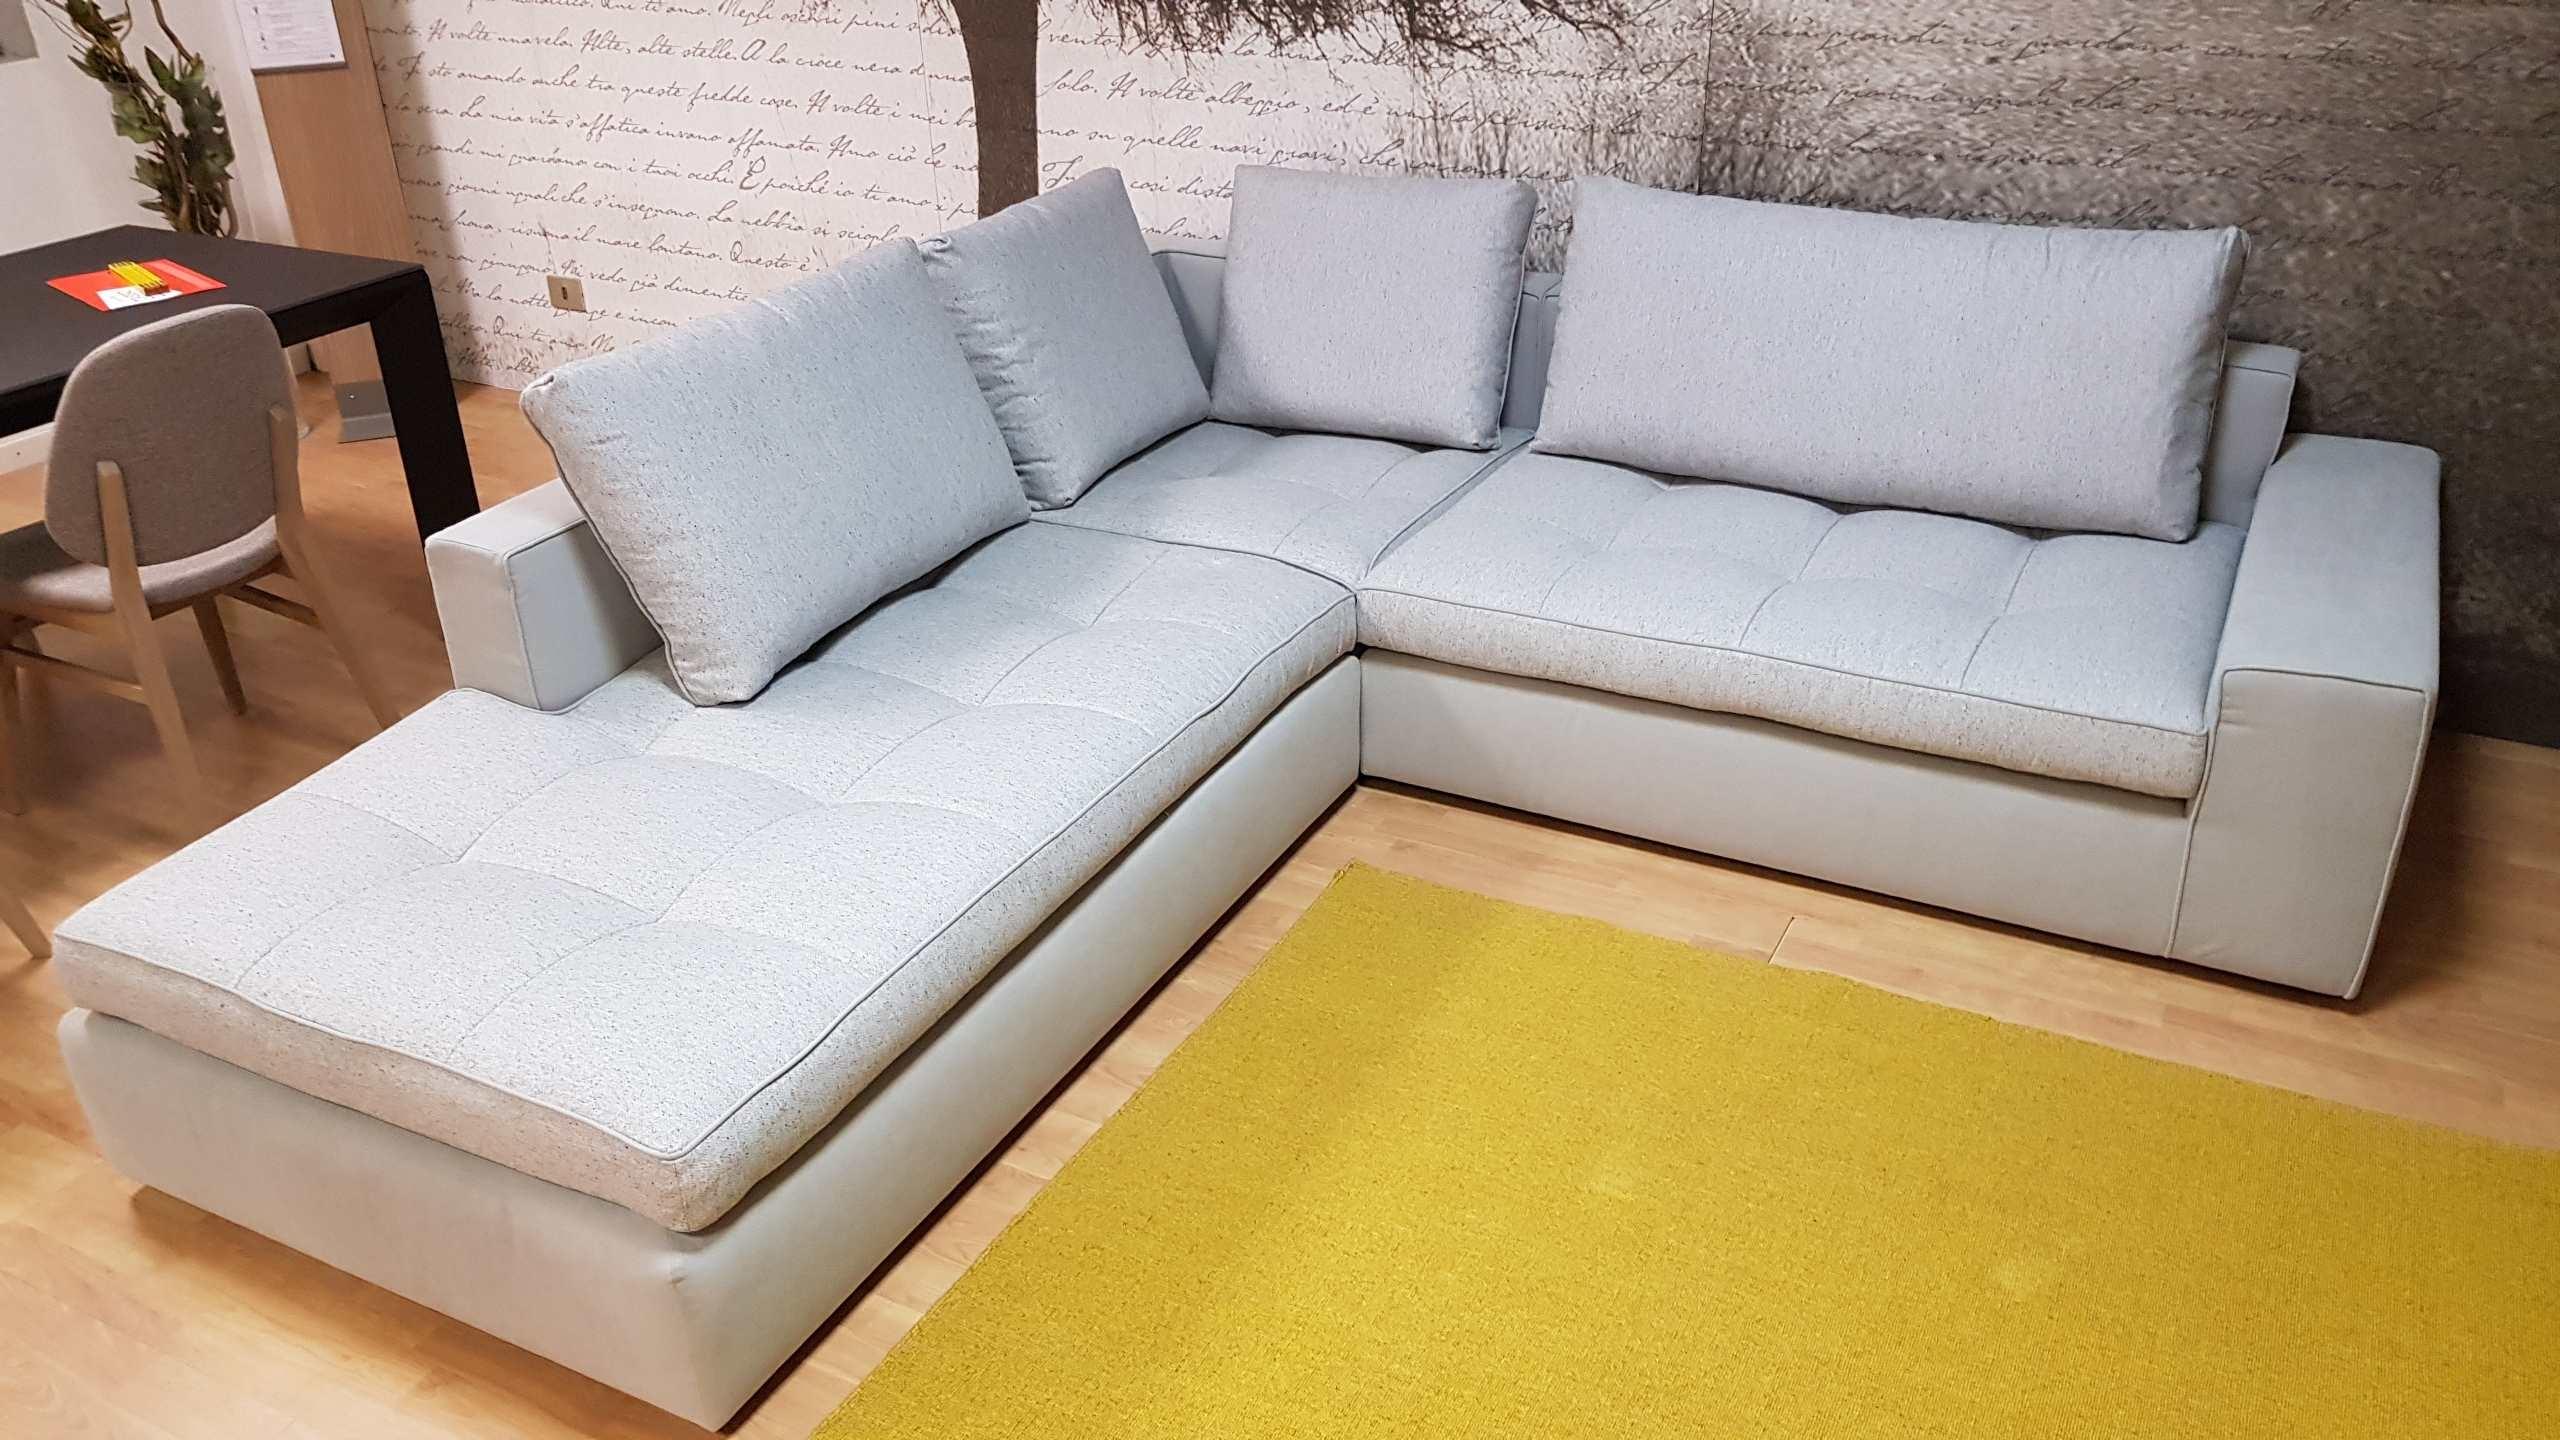 Outlet divano calligaris lounge mix divani a prezzi scontati for Outlet divani